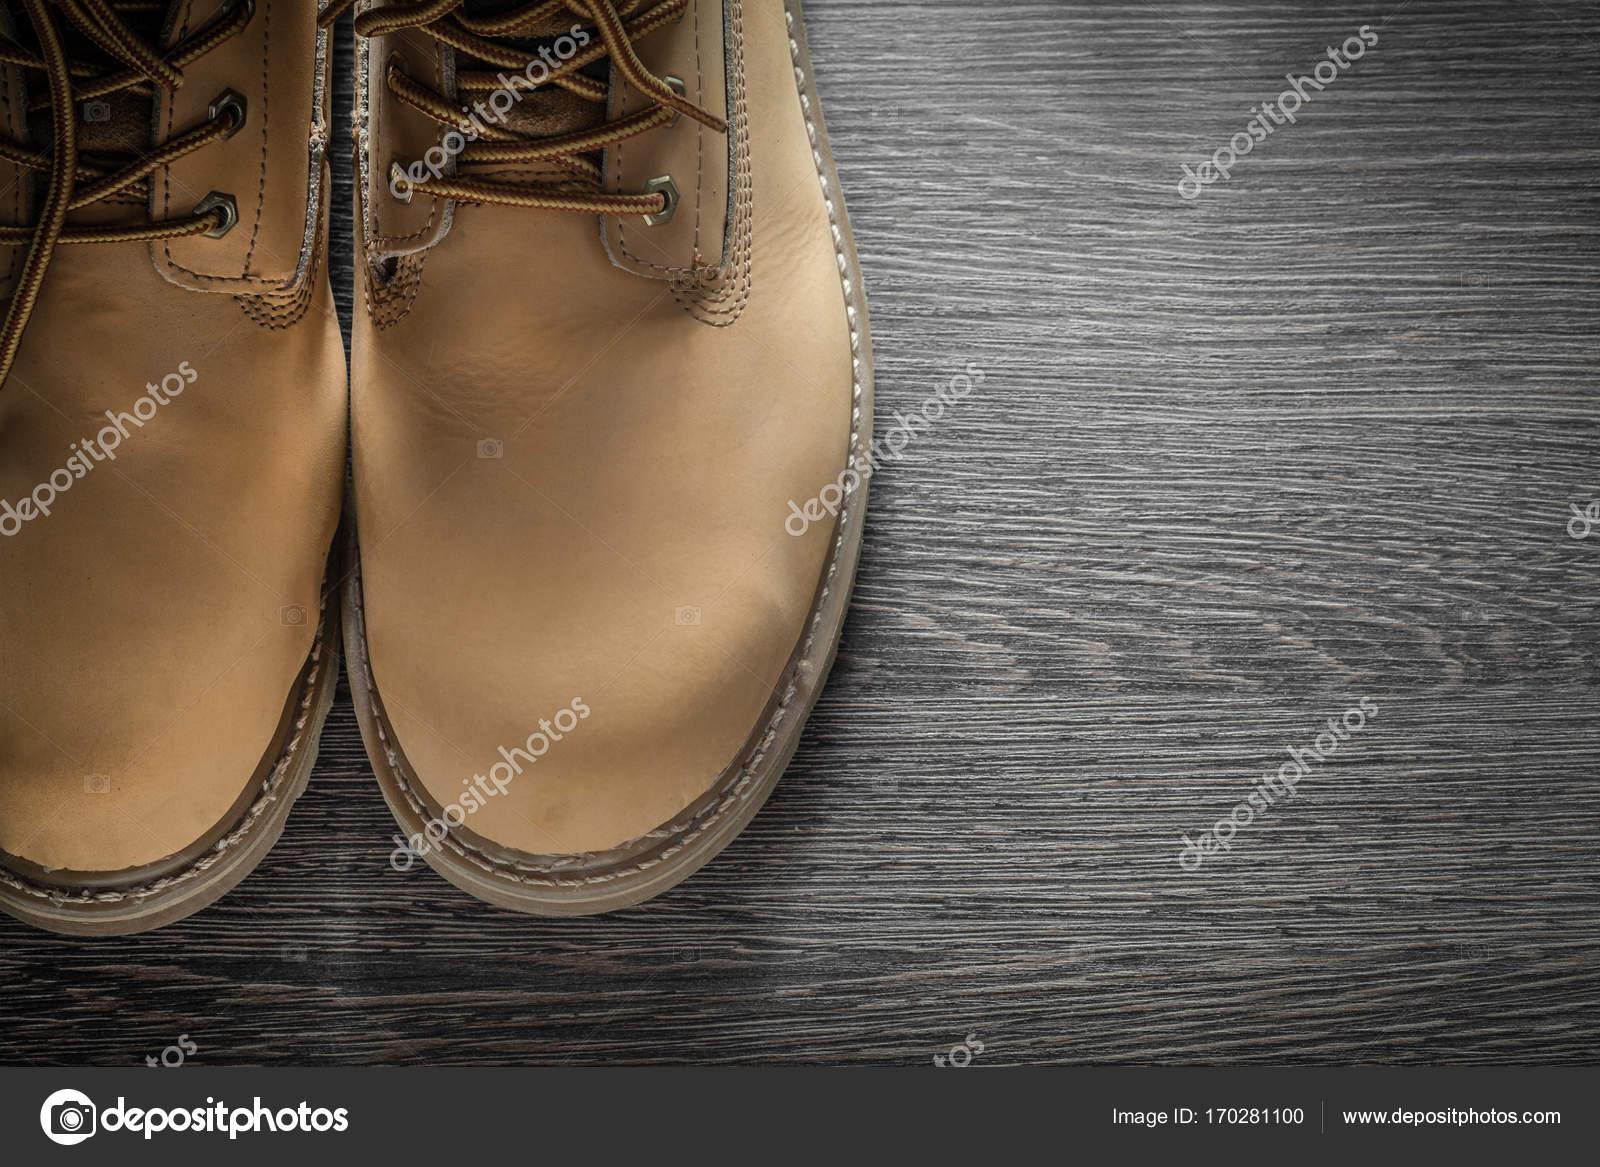 a663e6f7c3e Ζευγάρι ασφάλεια δερμάτινο κορδόνι μπότες για ξύλινη σανίδα– εικόνα αρχείου